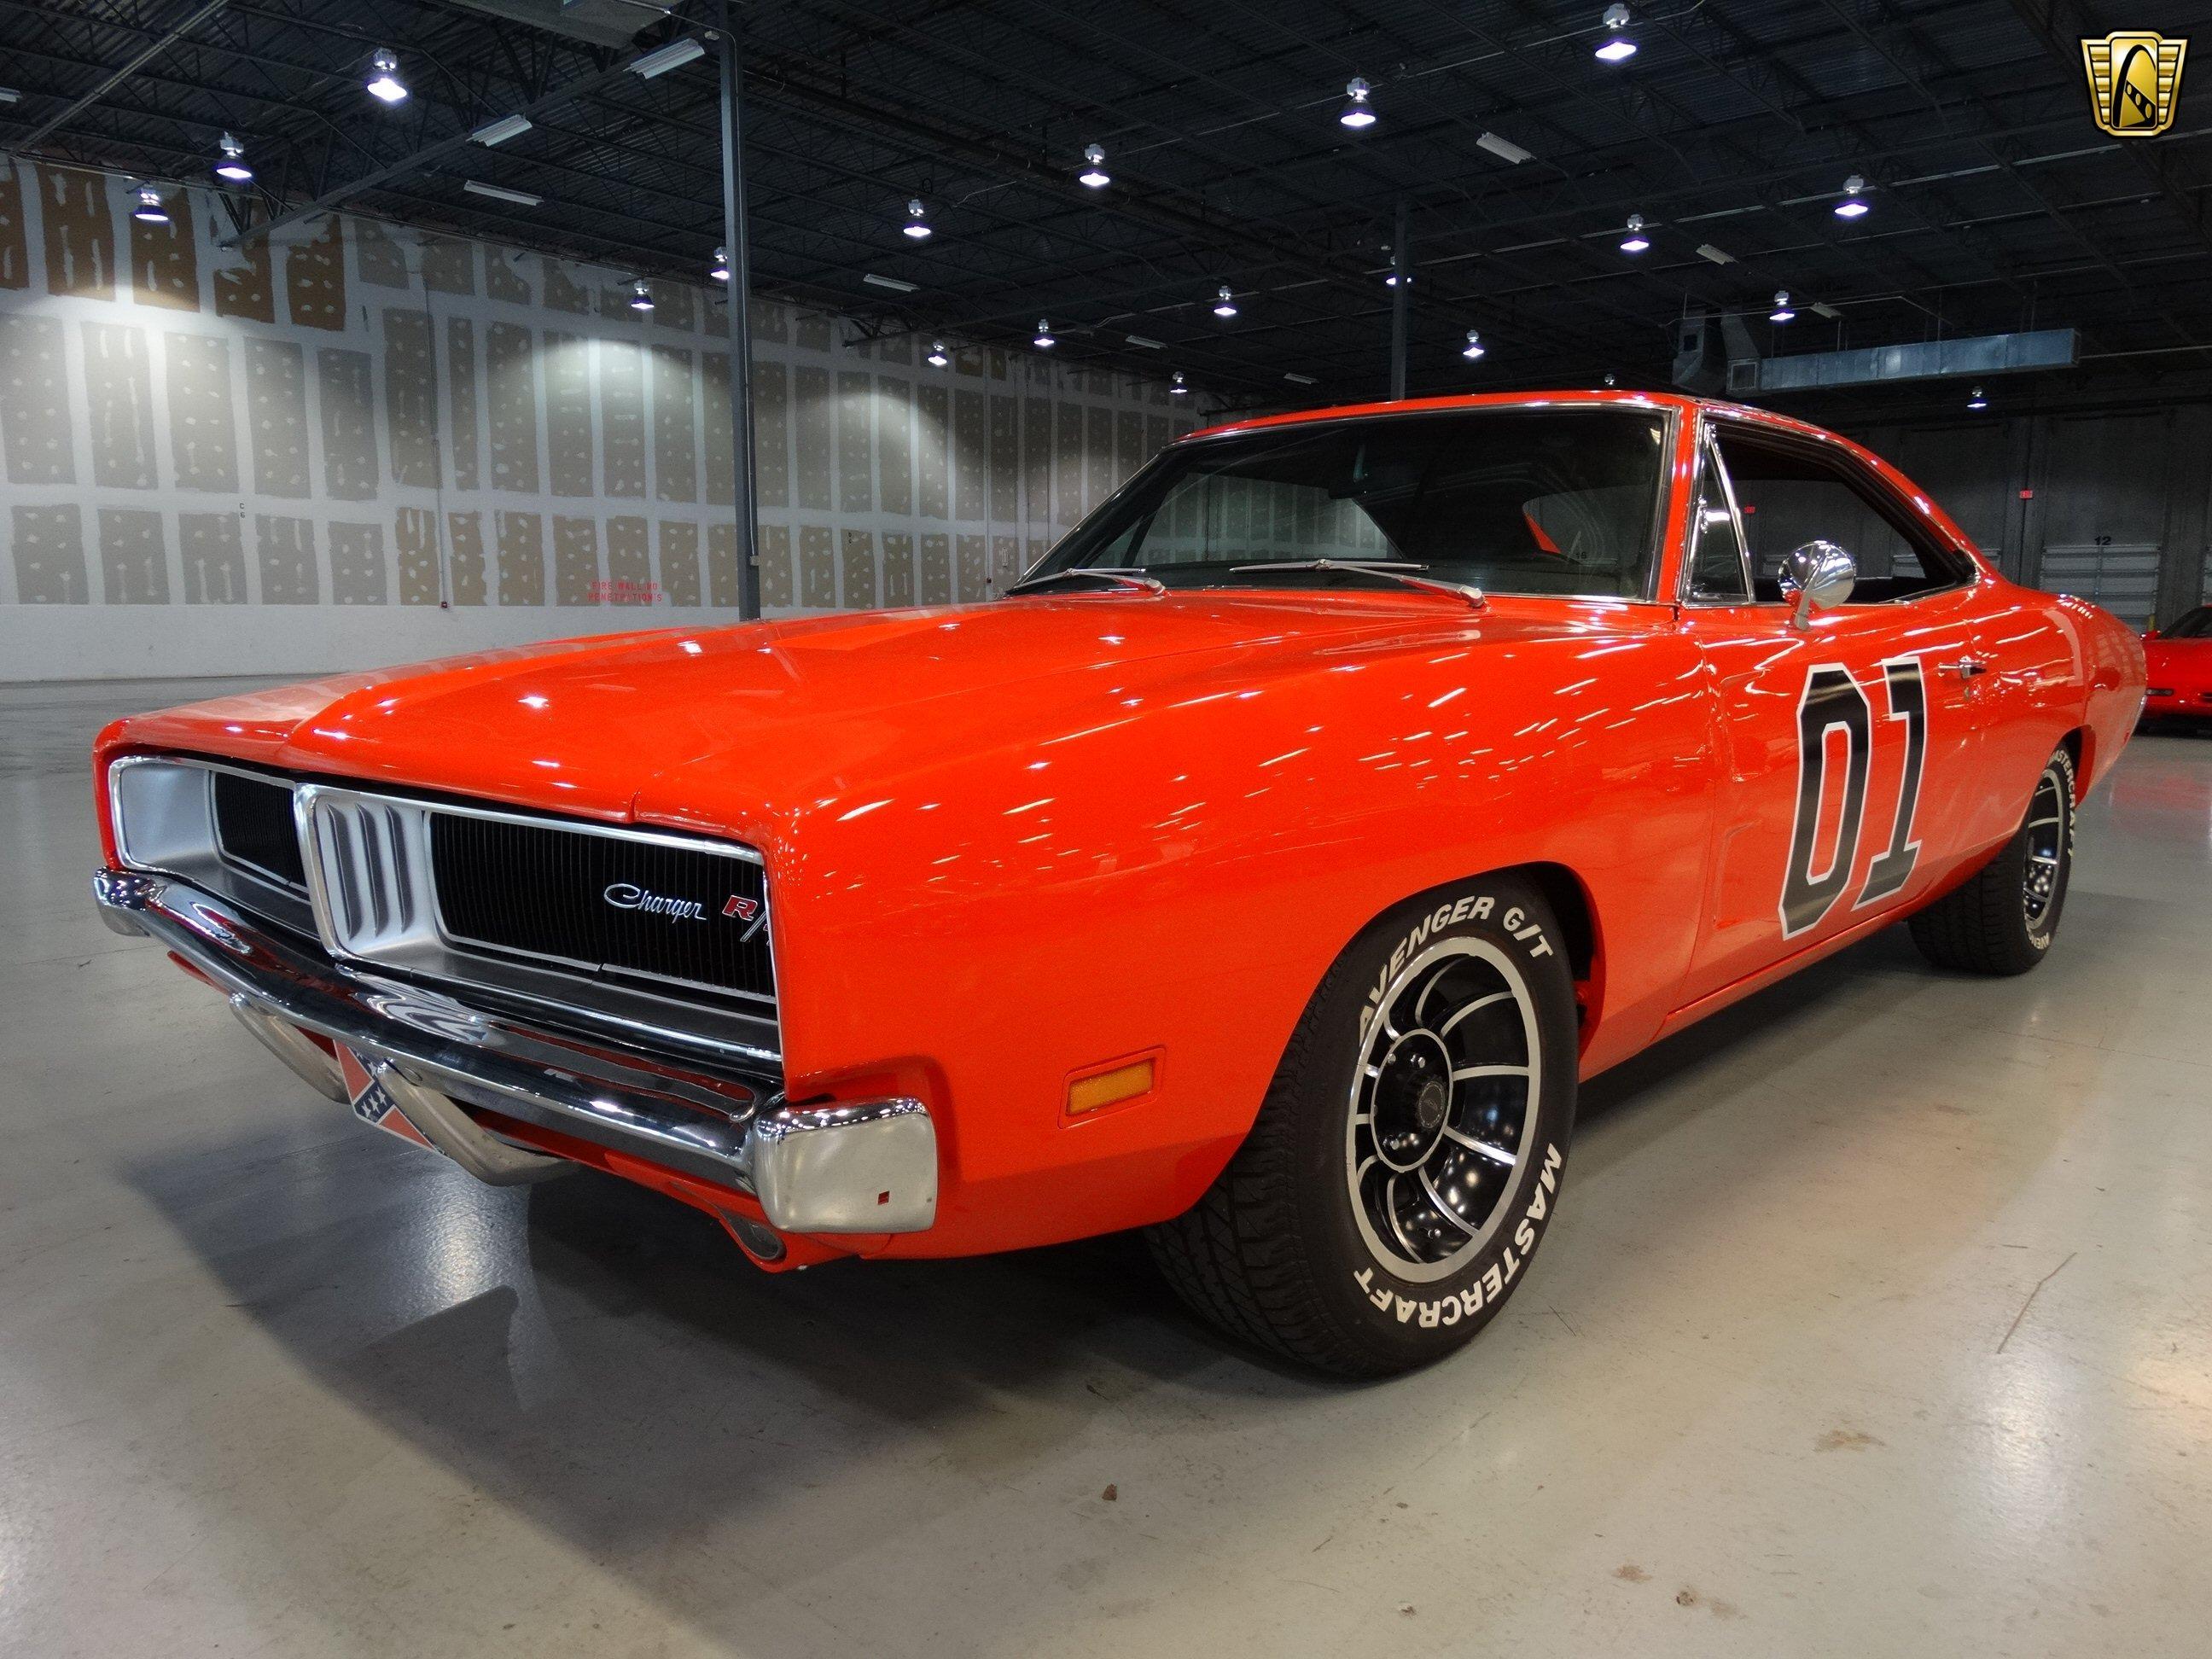 1969 Dodge Charger General Lee orange classic cars wallpaper ...